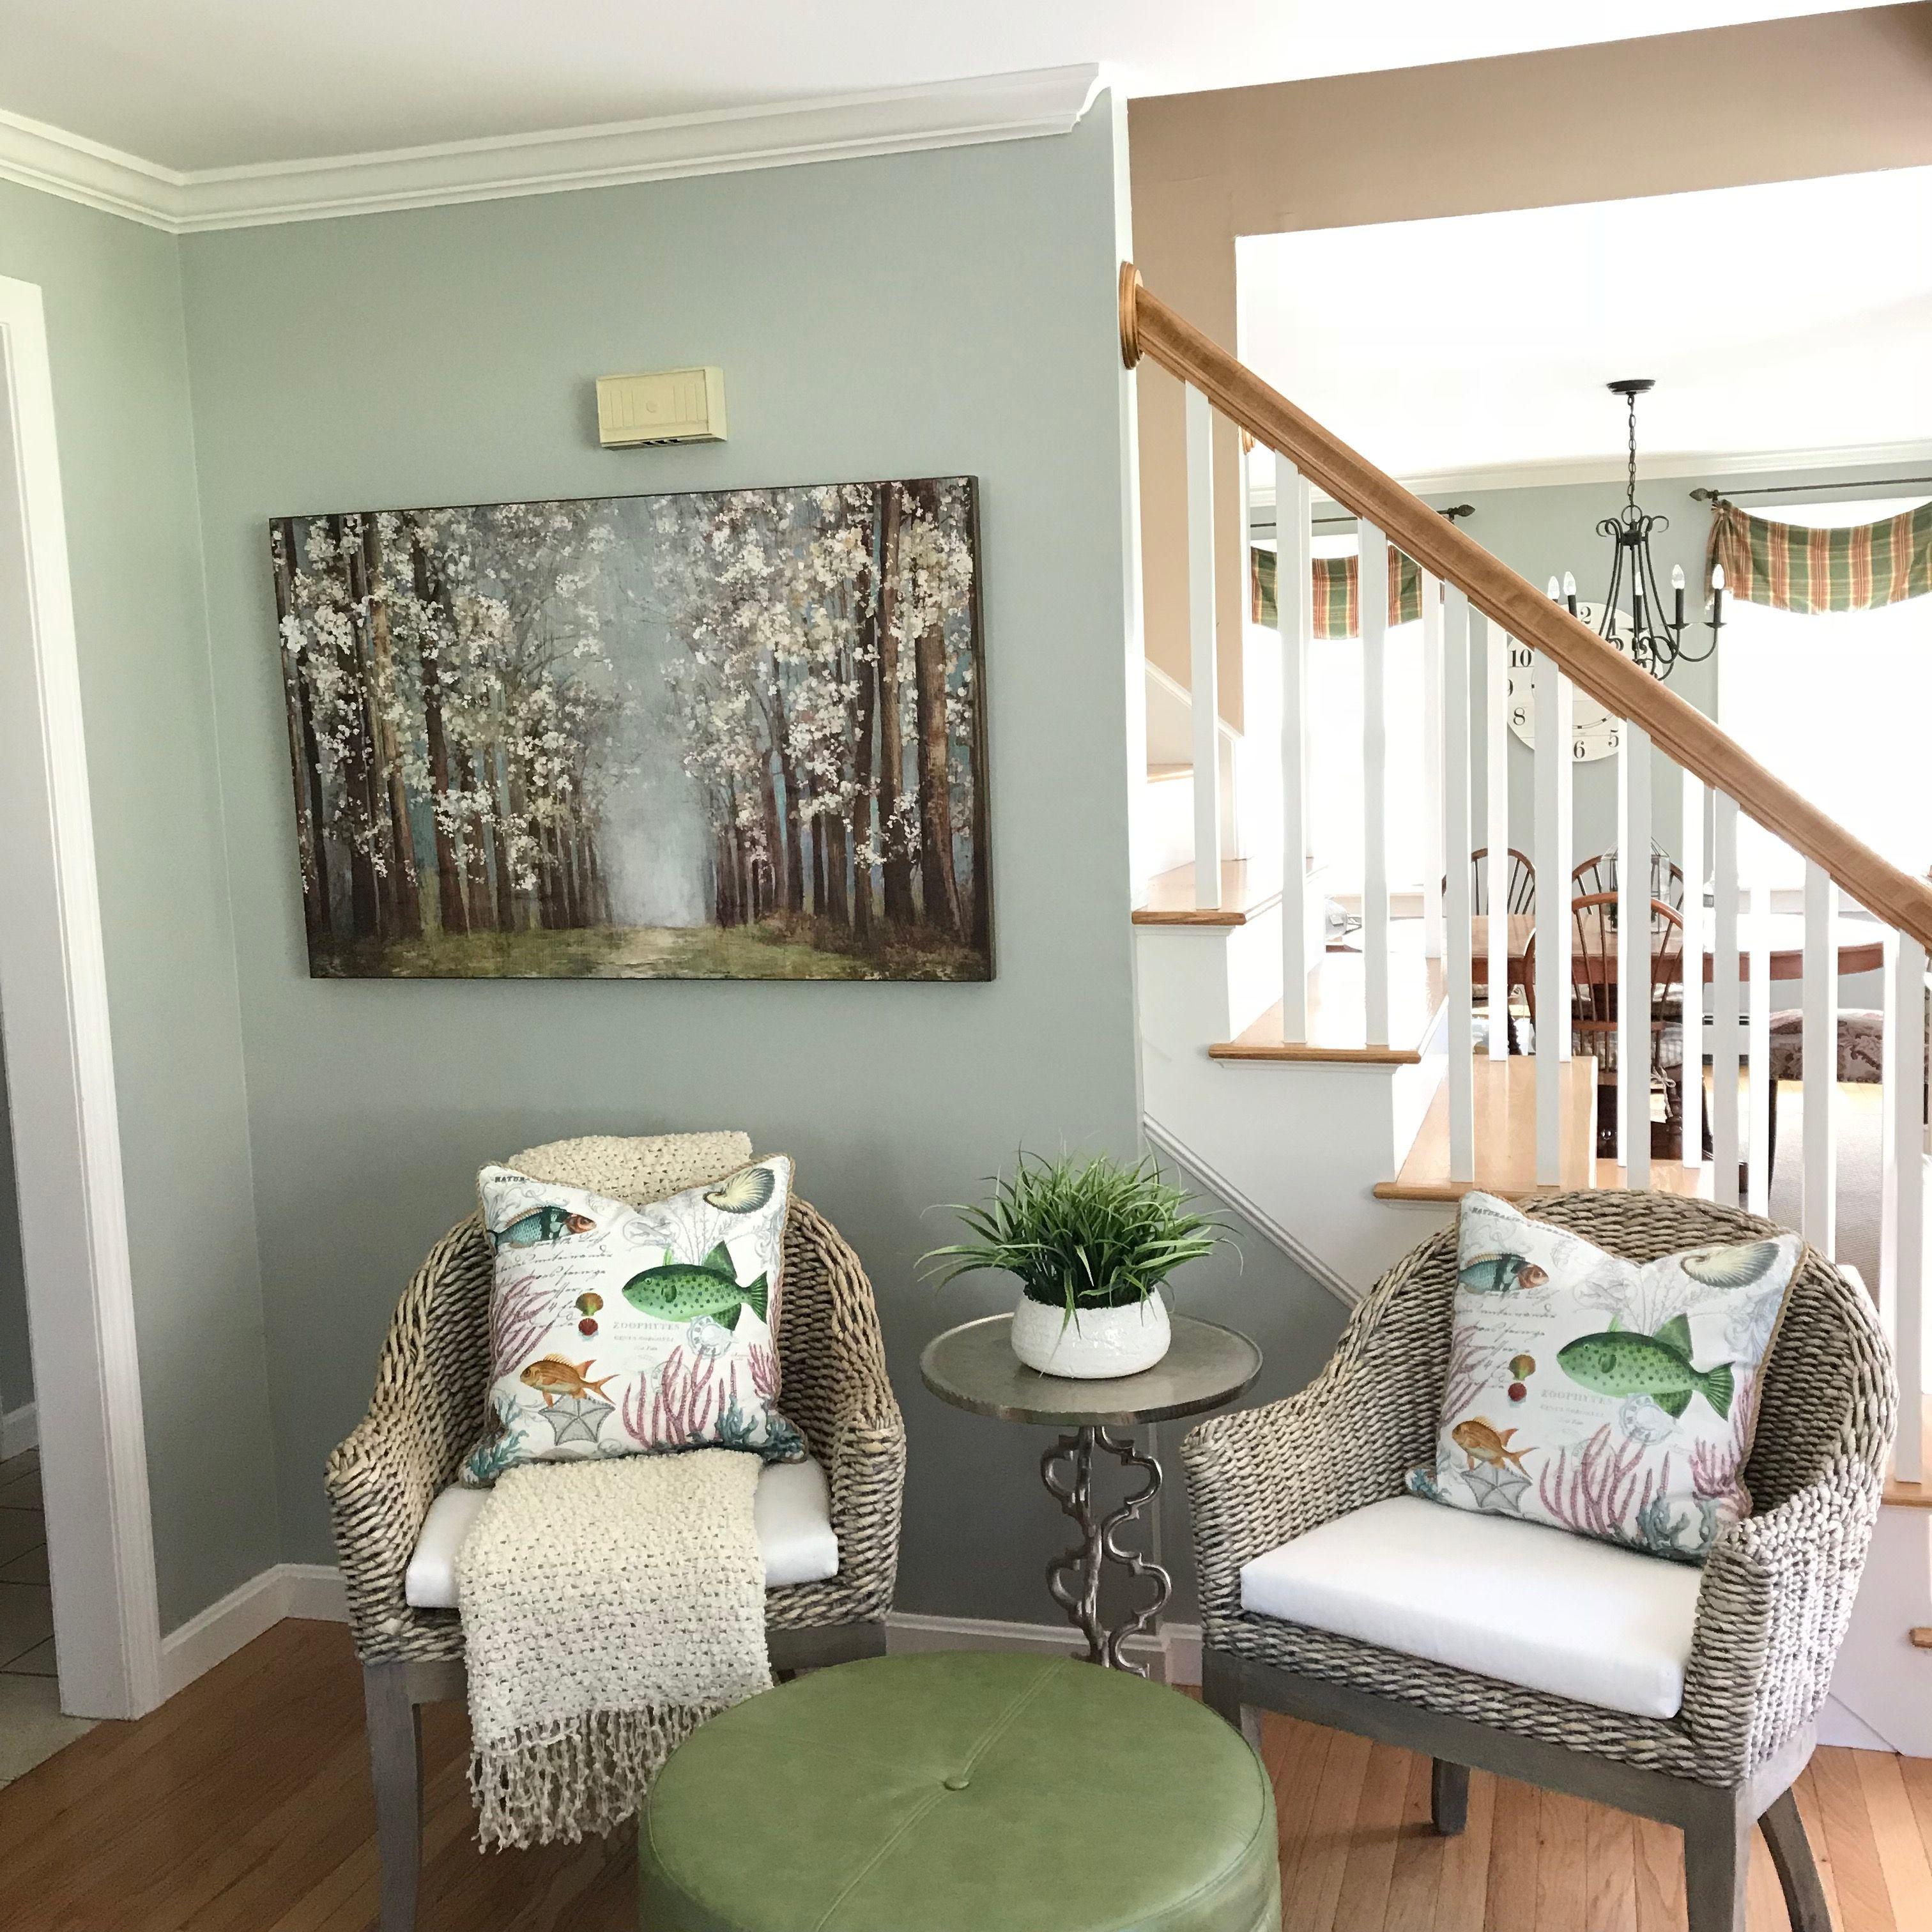 Home Staging Gallery: Interior, Home Decor, Interior Design